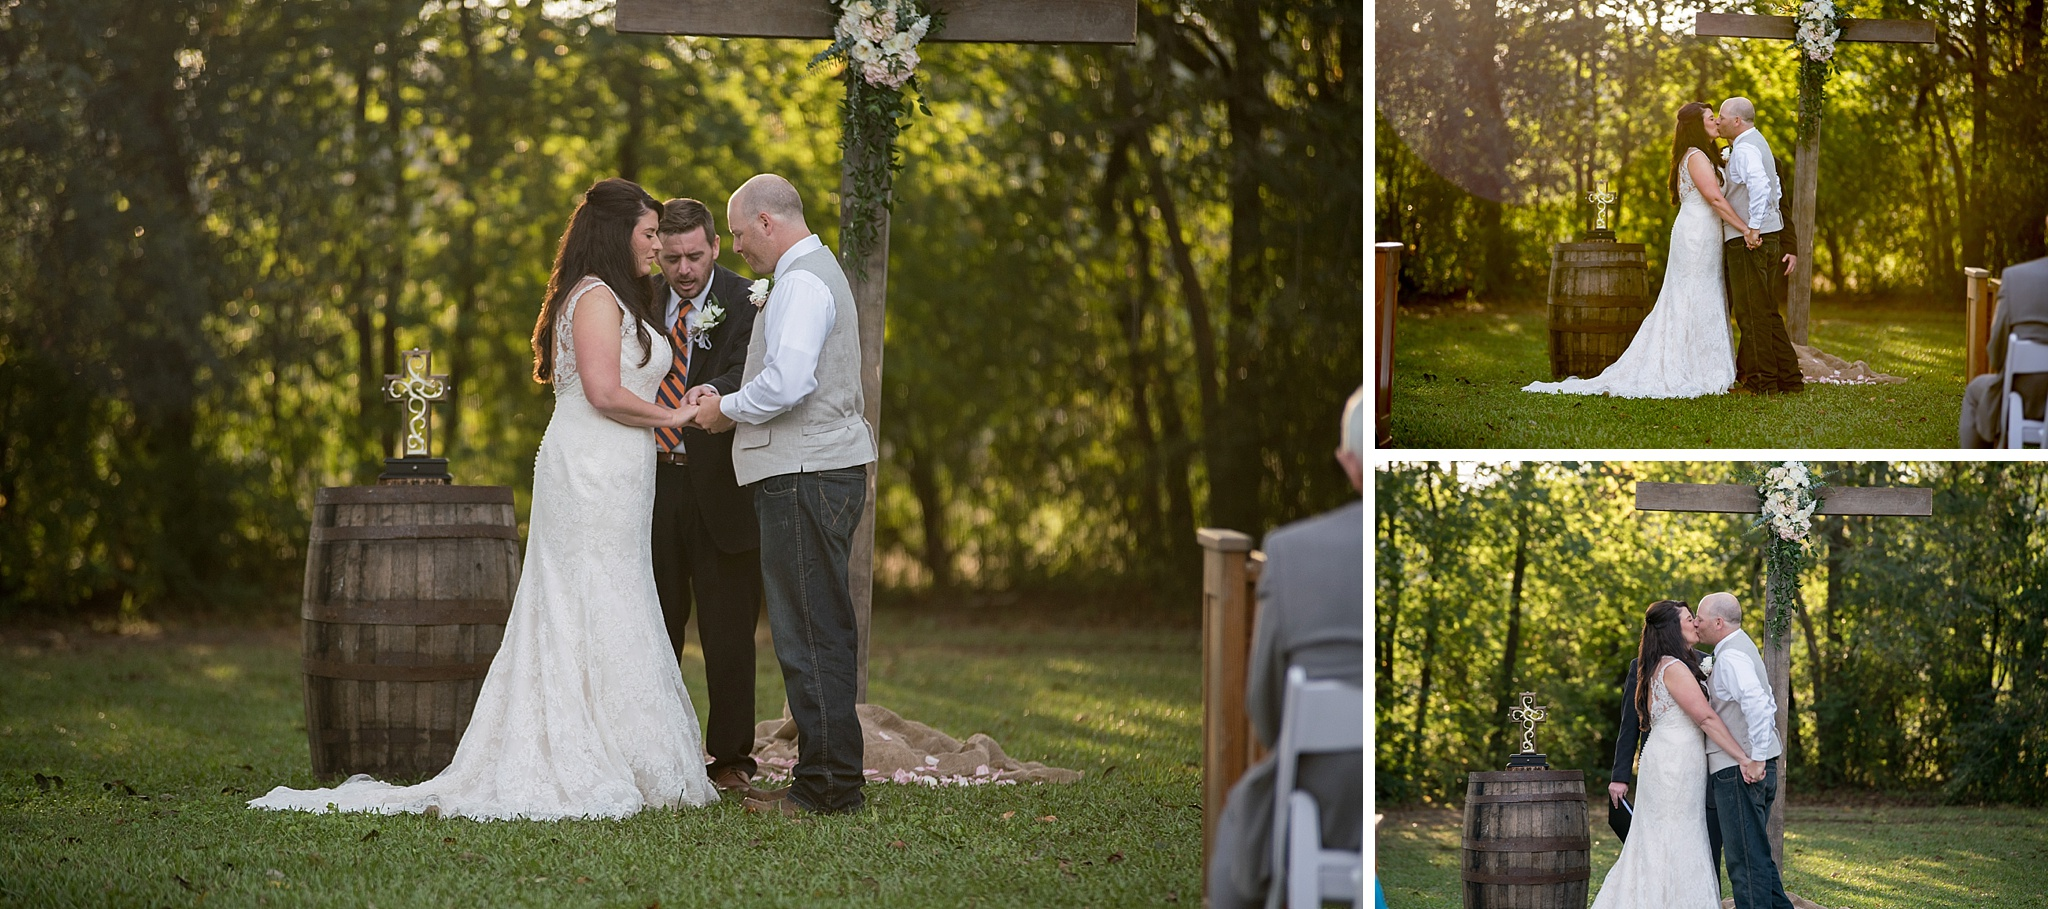 Tarboro-NC-Wedding-Photographer-054.jpg